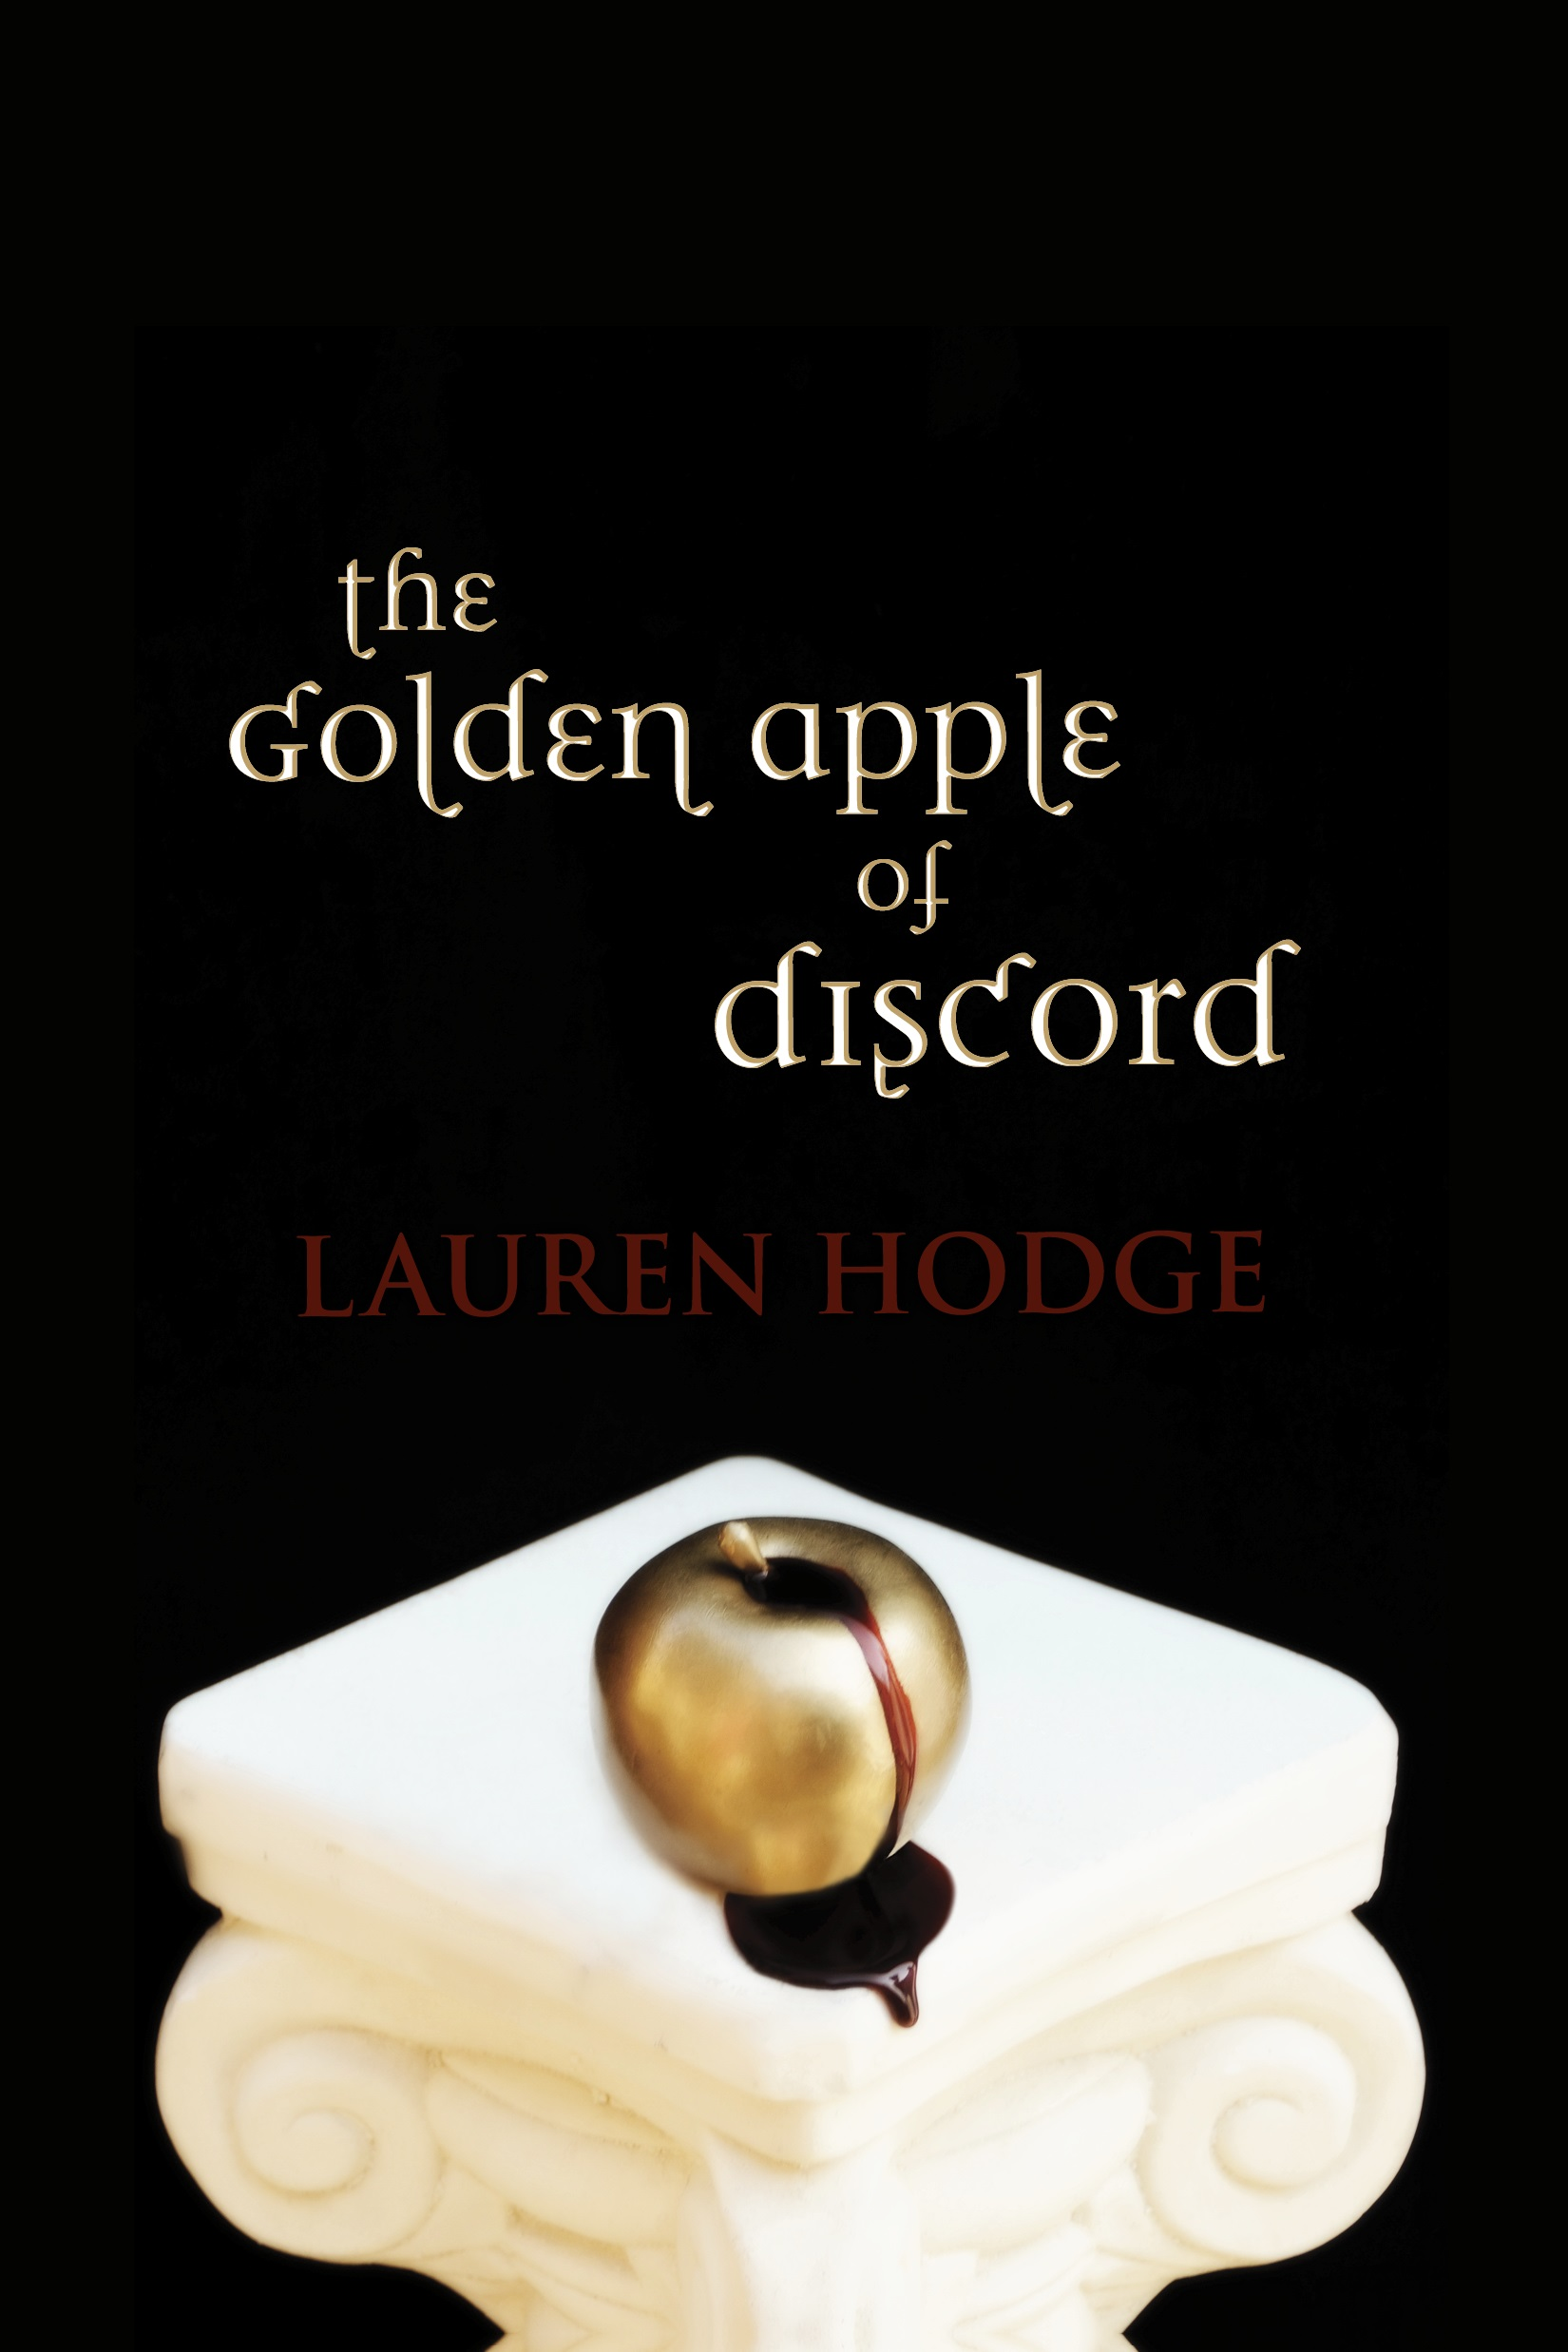 The Golden Apple of Discord, an Ebook by Lauren Hodge